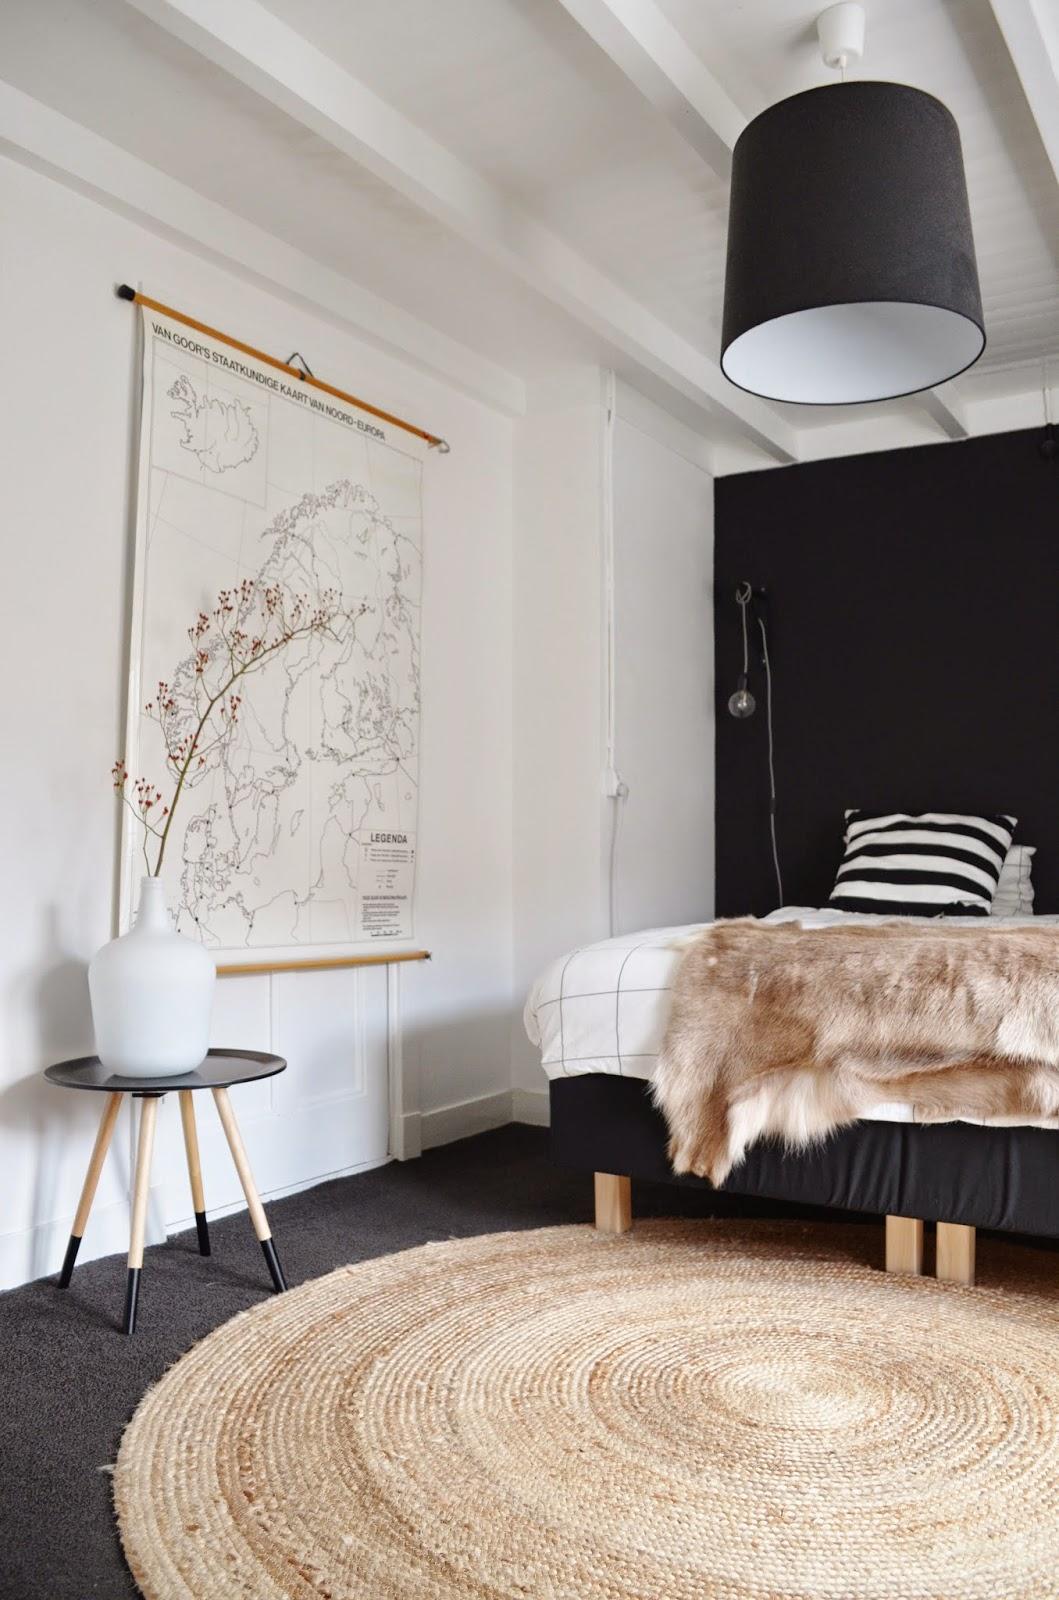 Awesome Slaapkamer Vloerkleed Photos - Ideeën Voor Thuis ...